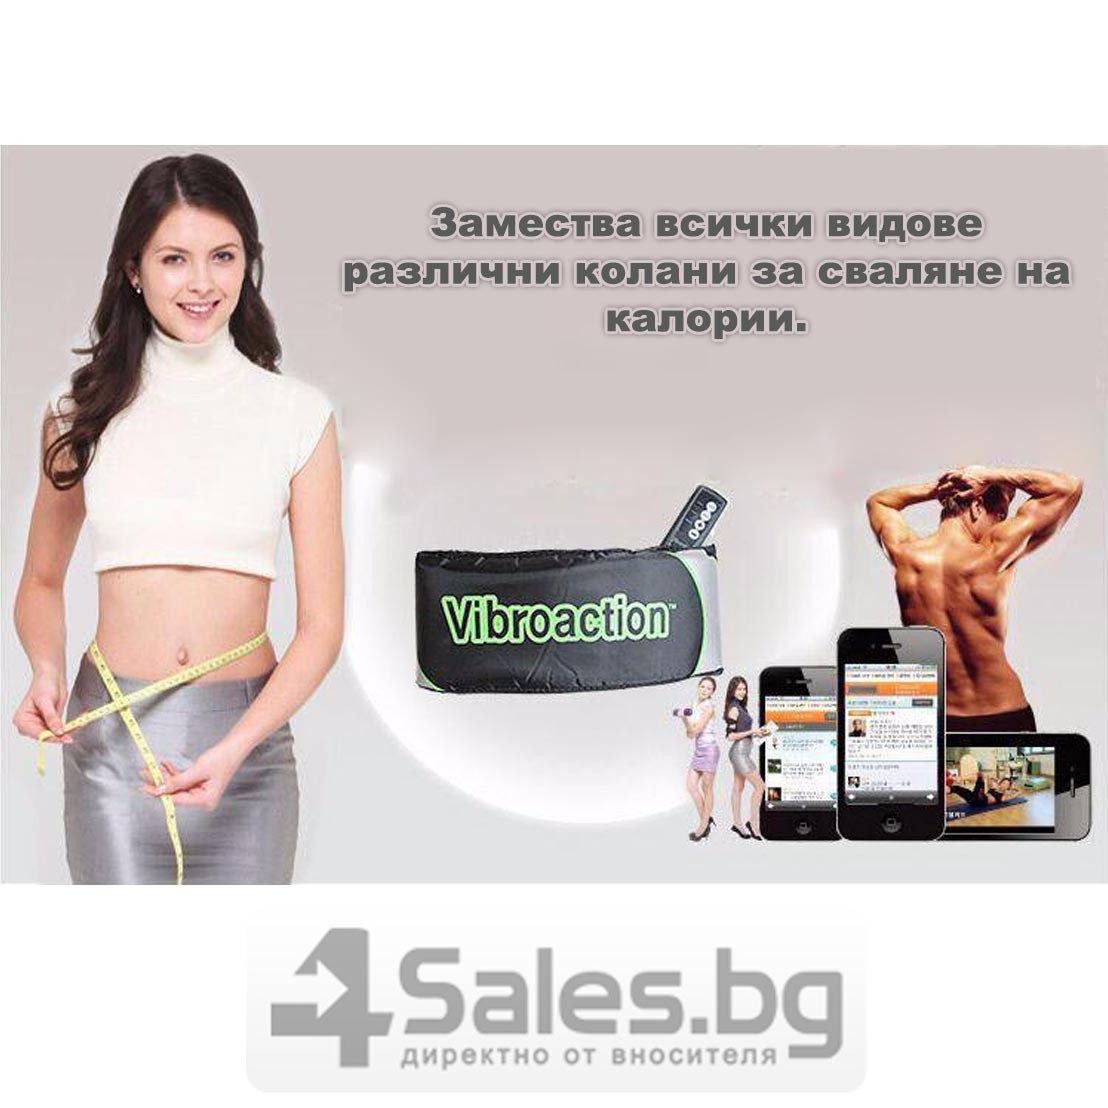 Вибромасажен колан – Vibroaction tv78 19